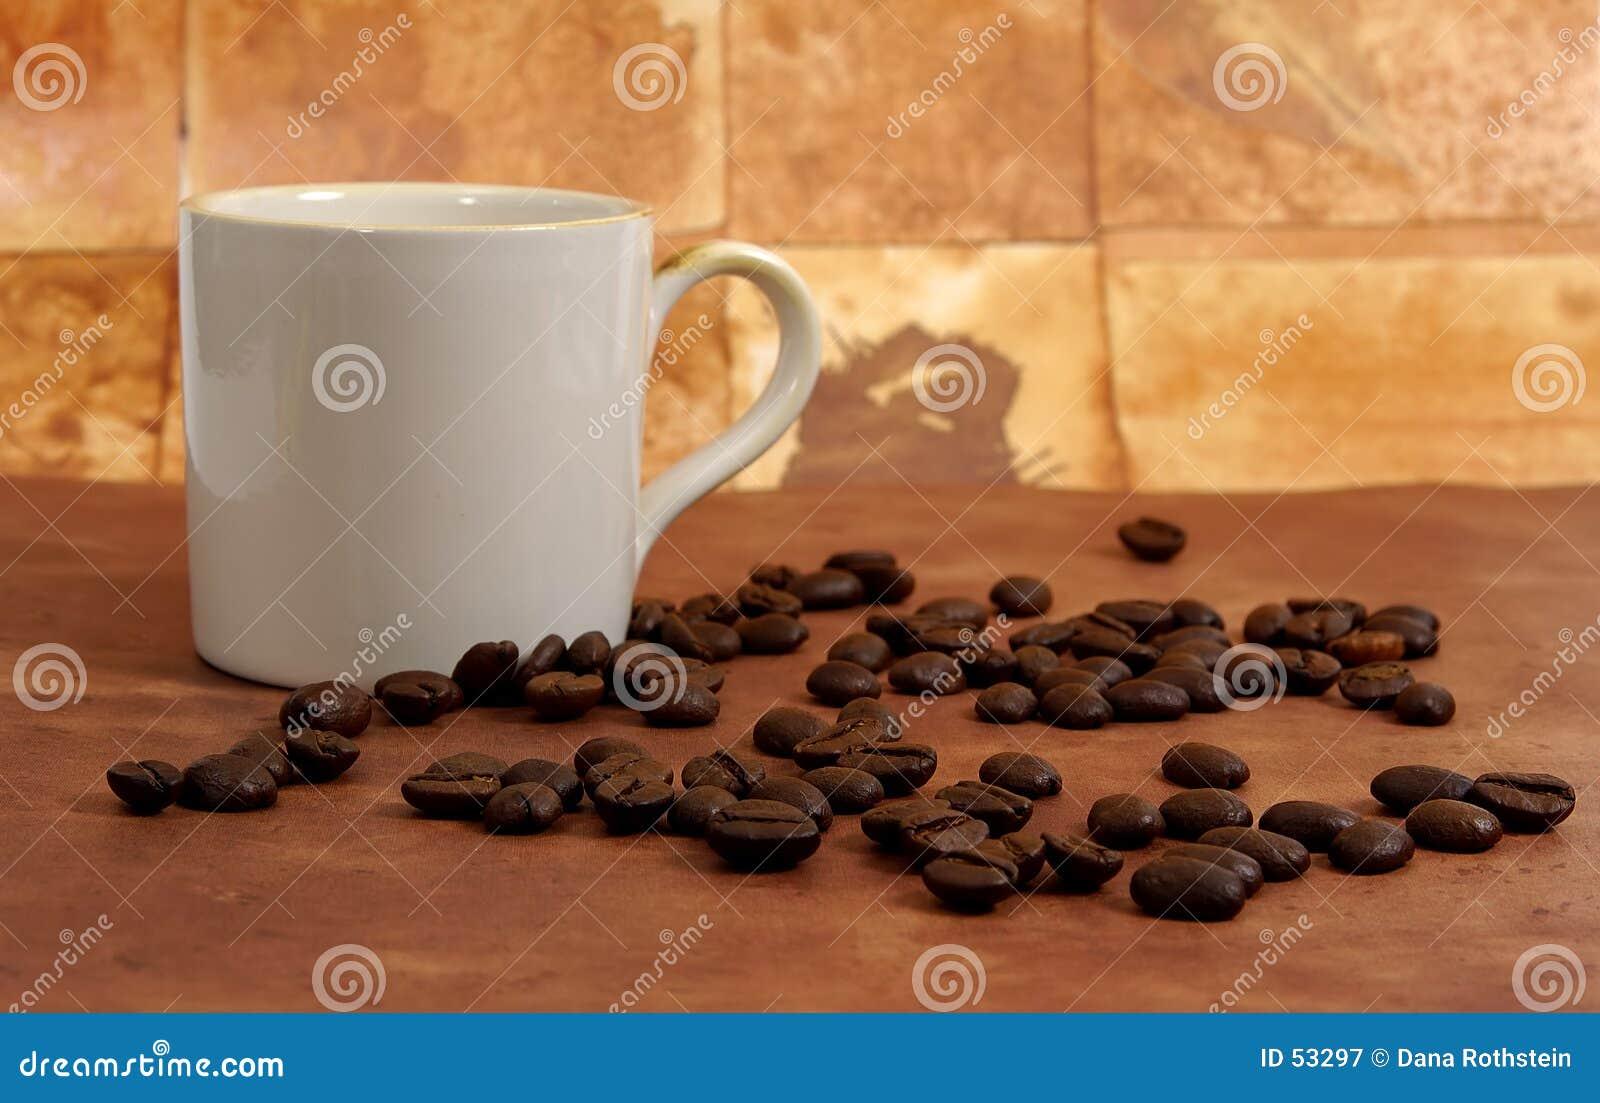 Download καφές σπασιμάτων στοκ εικόνα. εικόνα από αδελφών, καφές - 53297